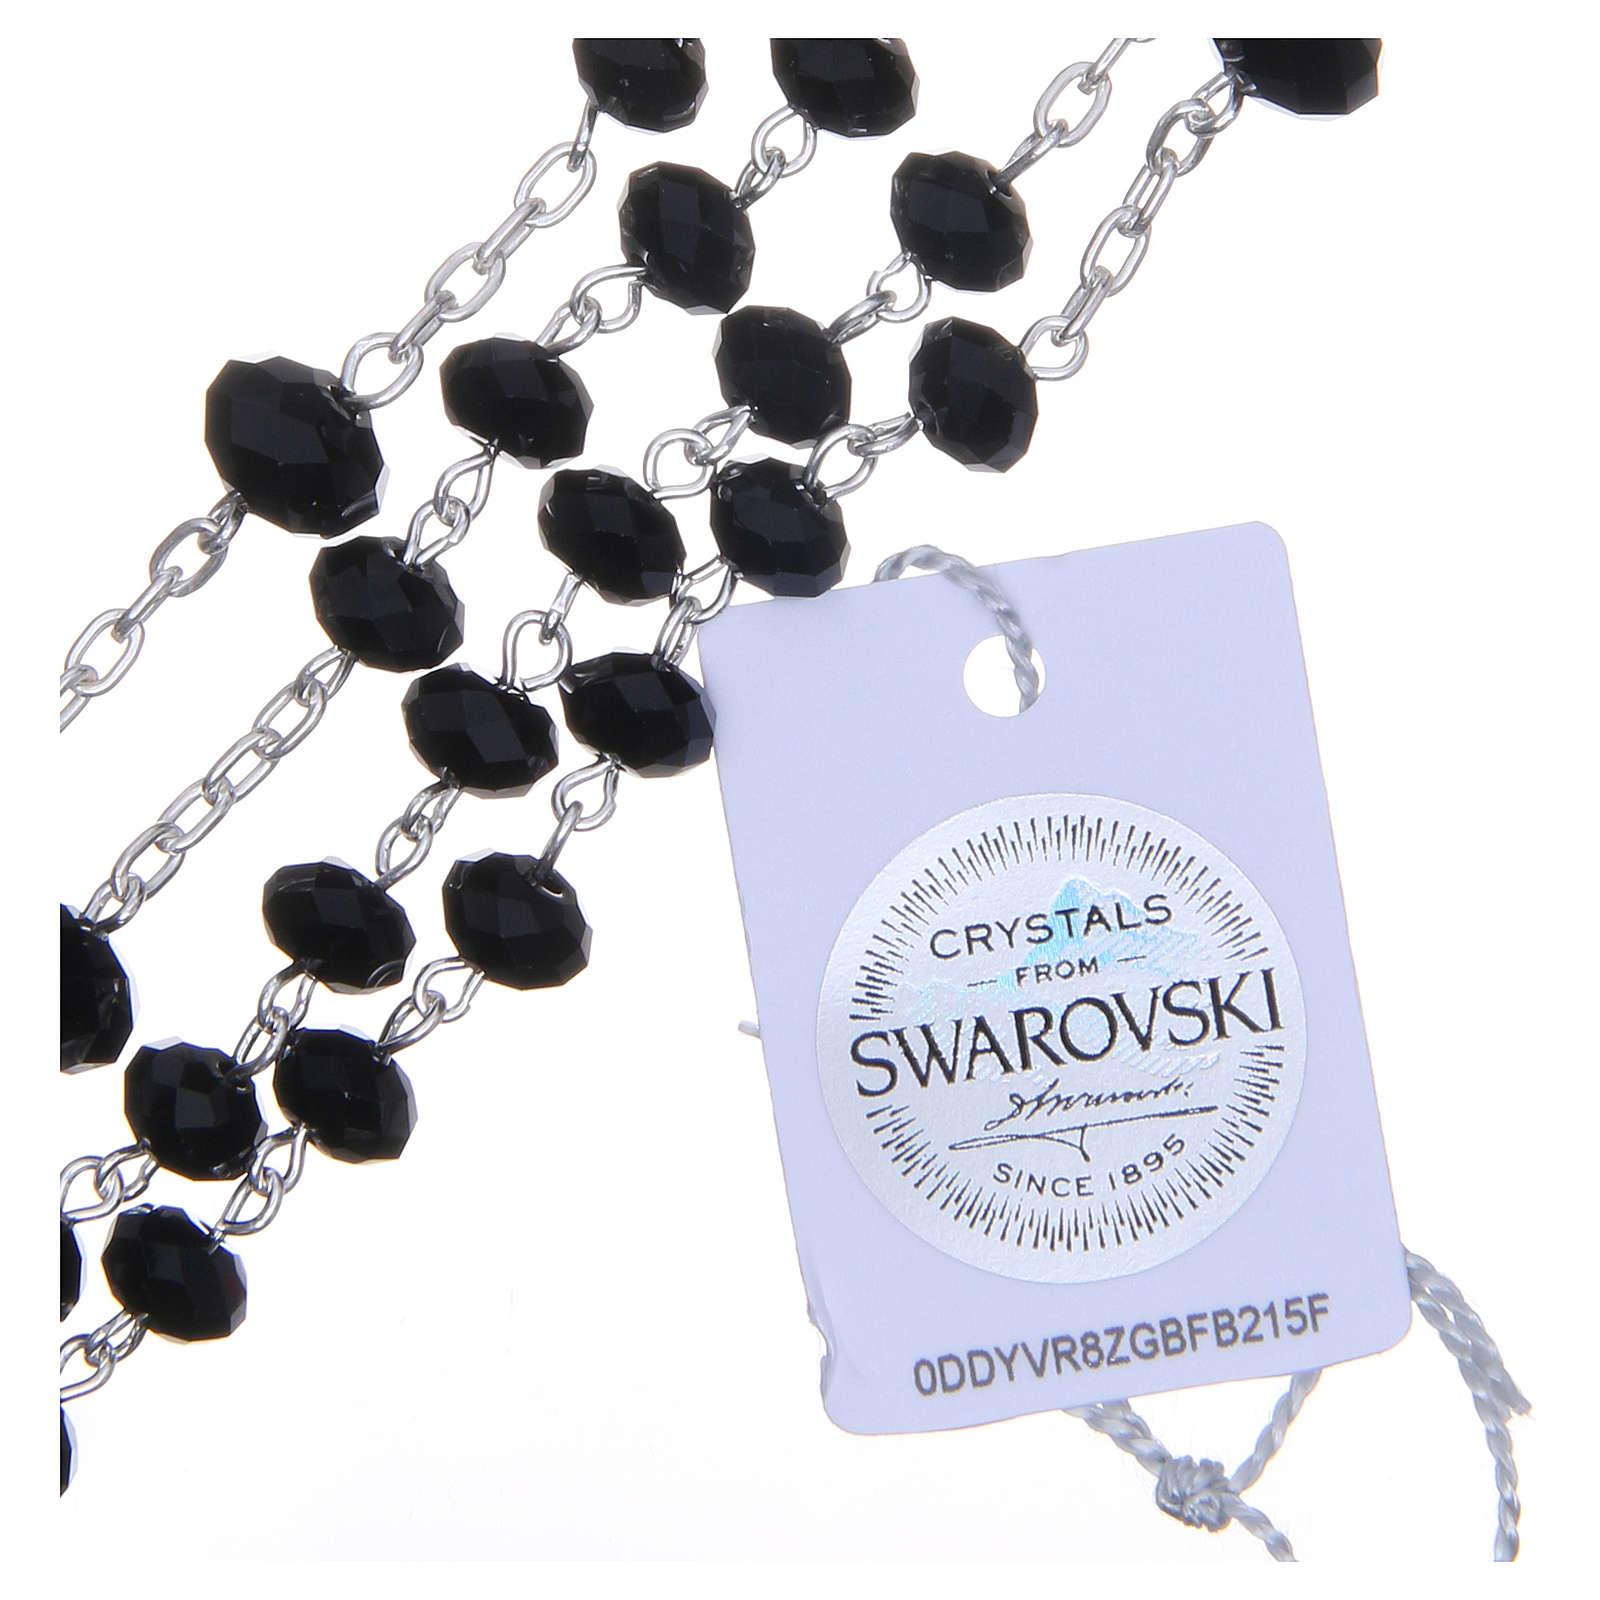 Rosario plata 925 cristal Swarovski briolette 6 mm negro 4